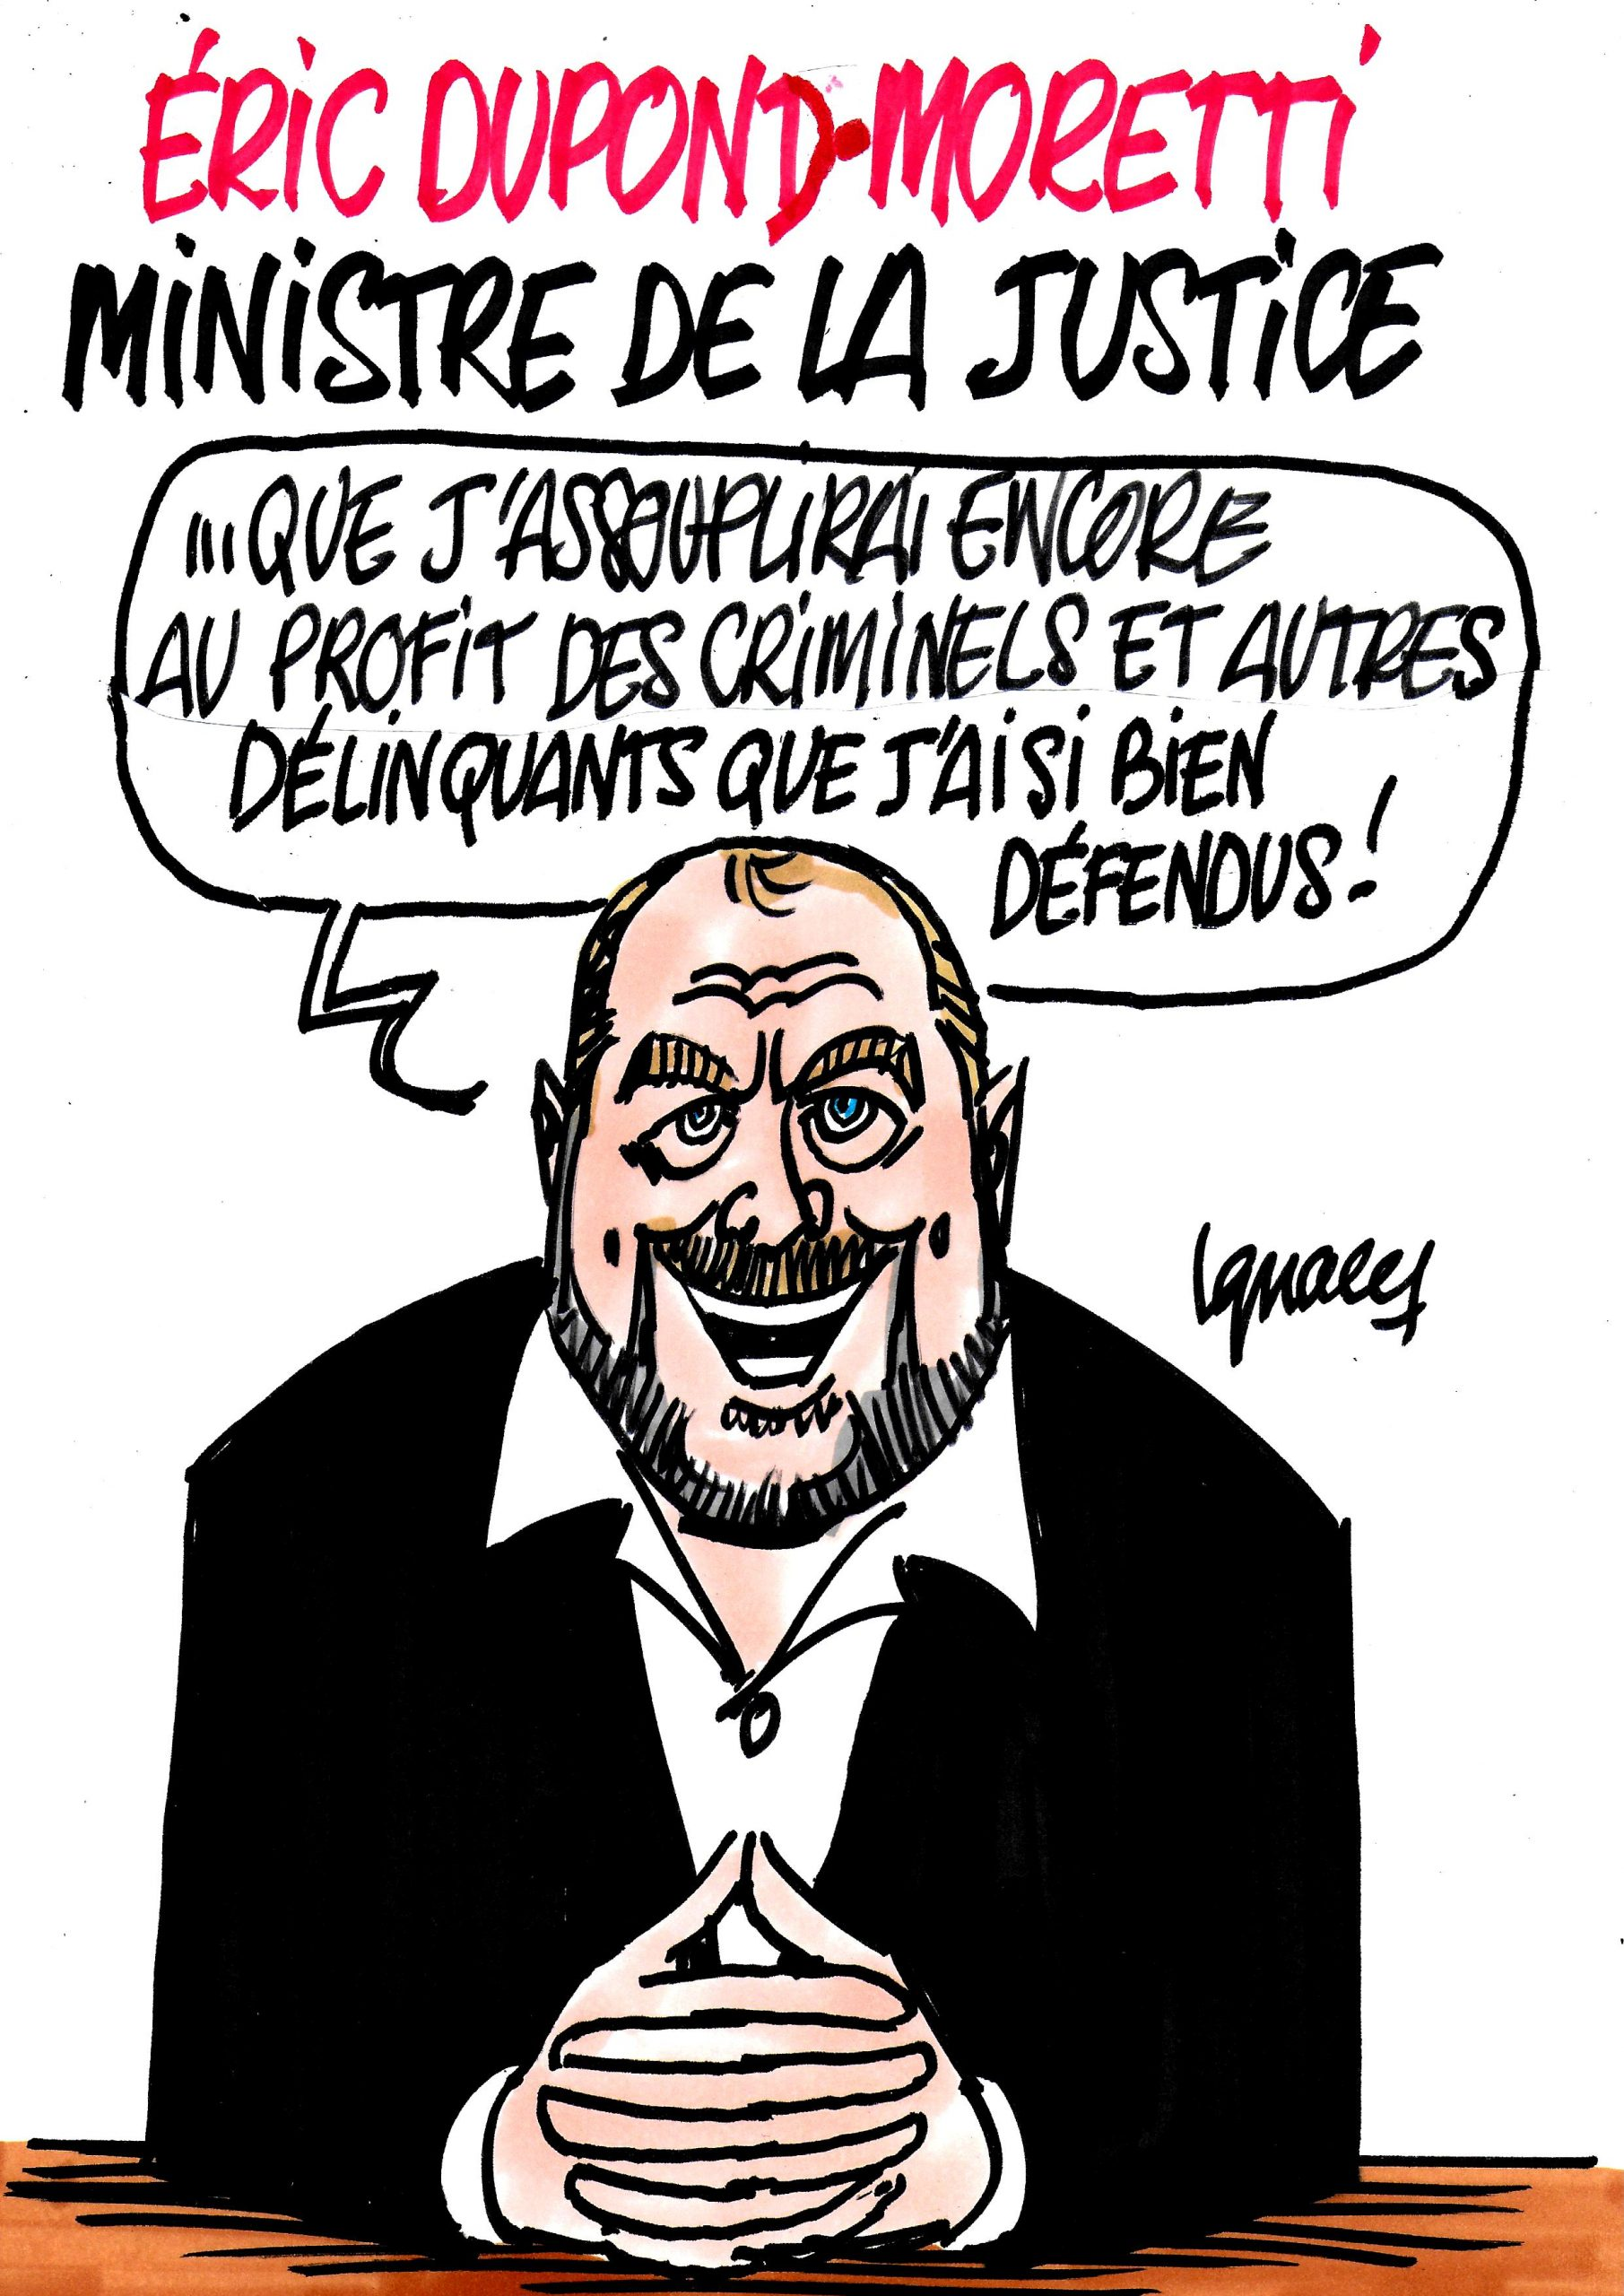 Ignace - Dupond-Moretti ministre de la justice